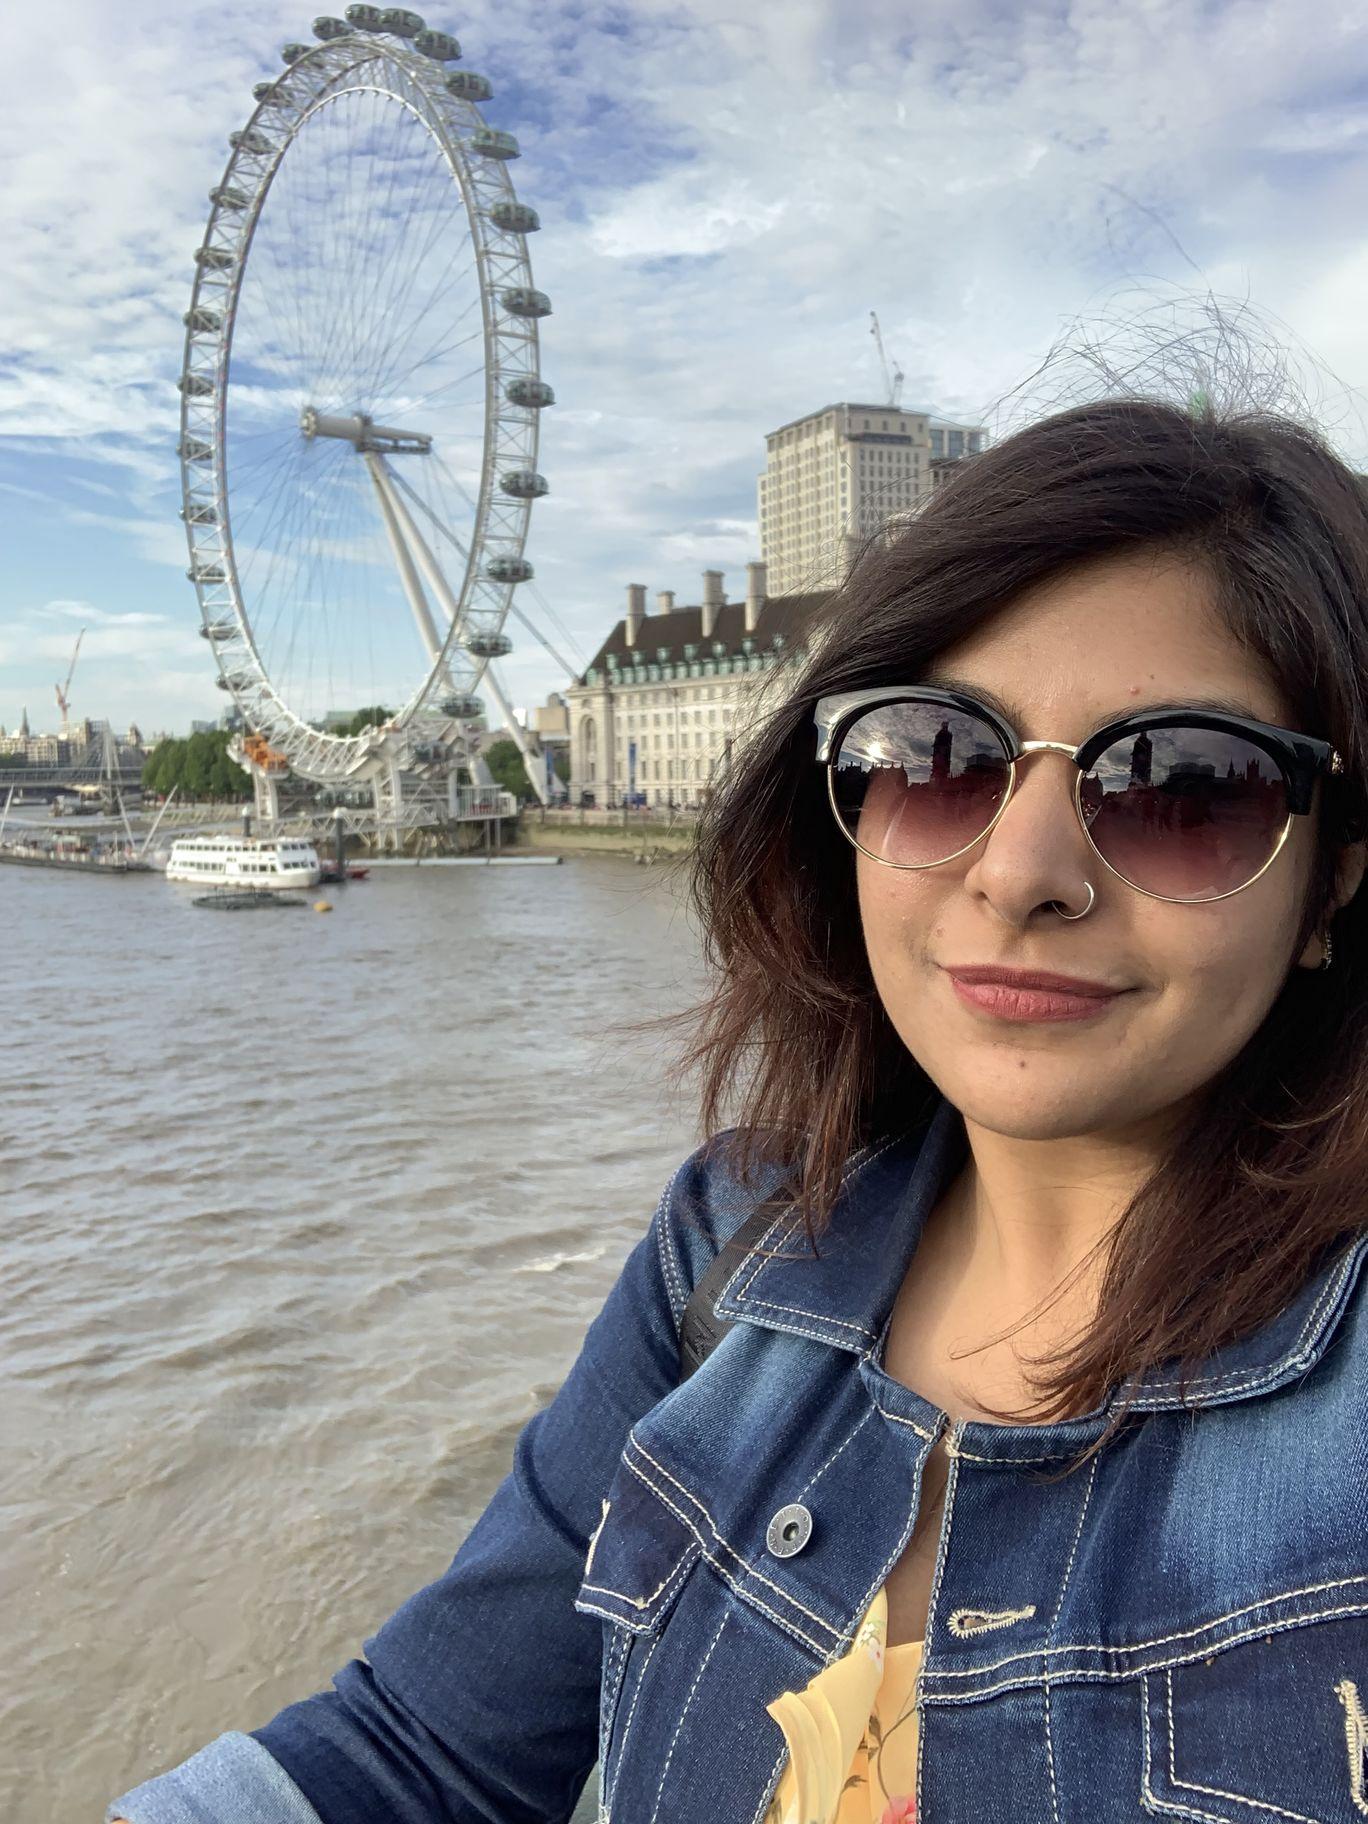 Photo of London Eye By Taneya Singh